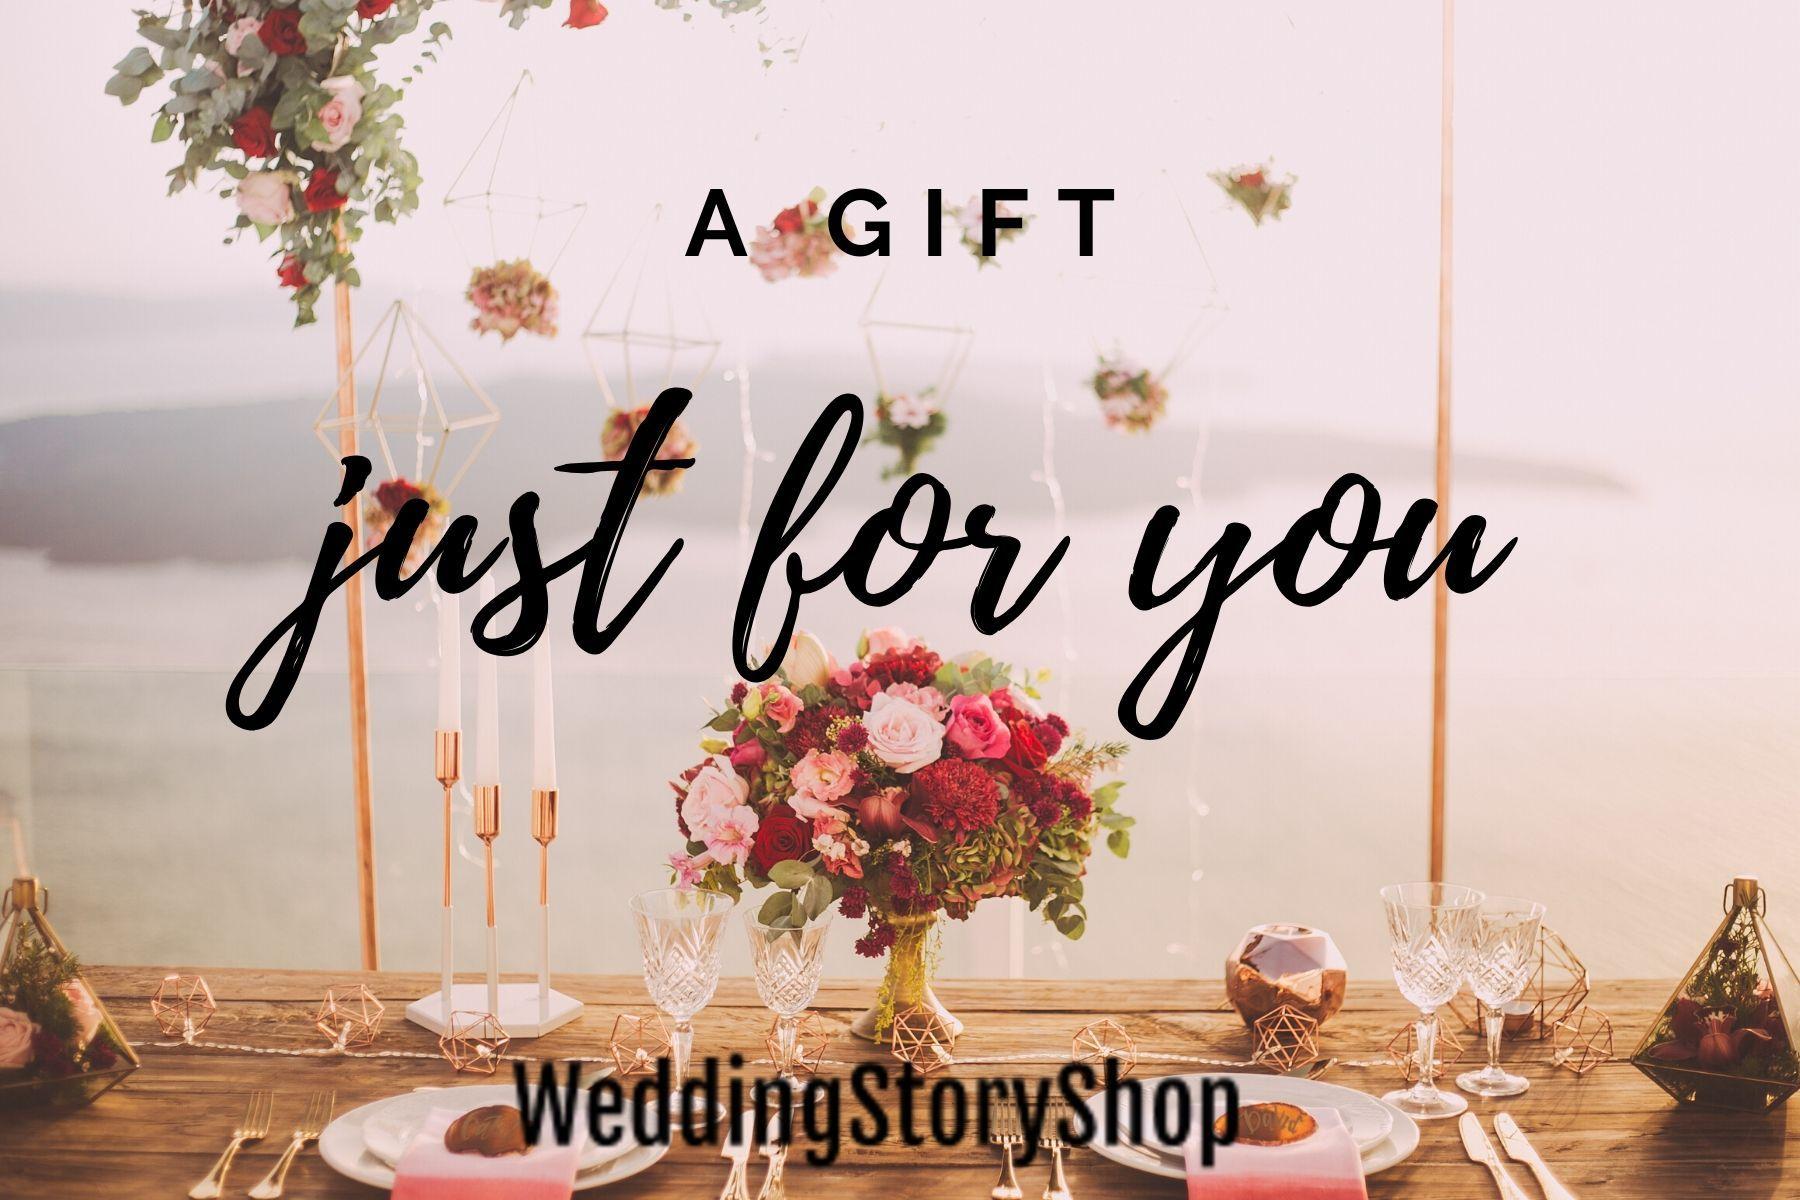 Gift Card Weddingstoryshop Wedding Gift Ideas Giftcard Onlineshopping Wedding Bride In 2020 Wedding Gifts Diy Wedding Planner Gift Card Specials